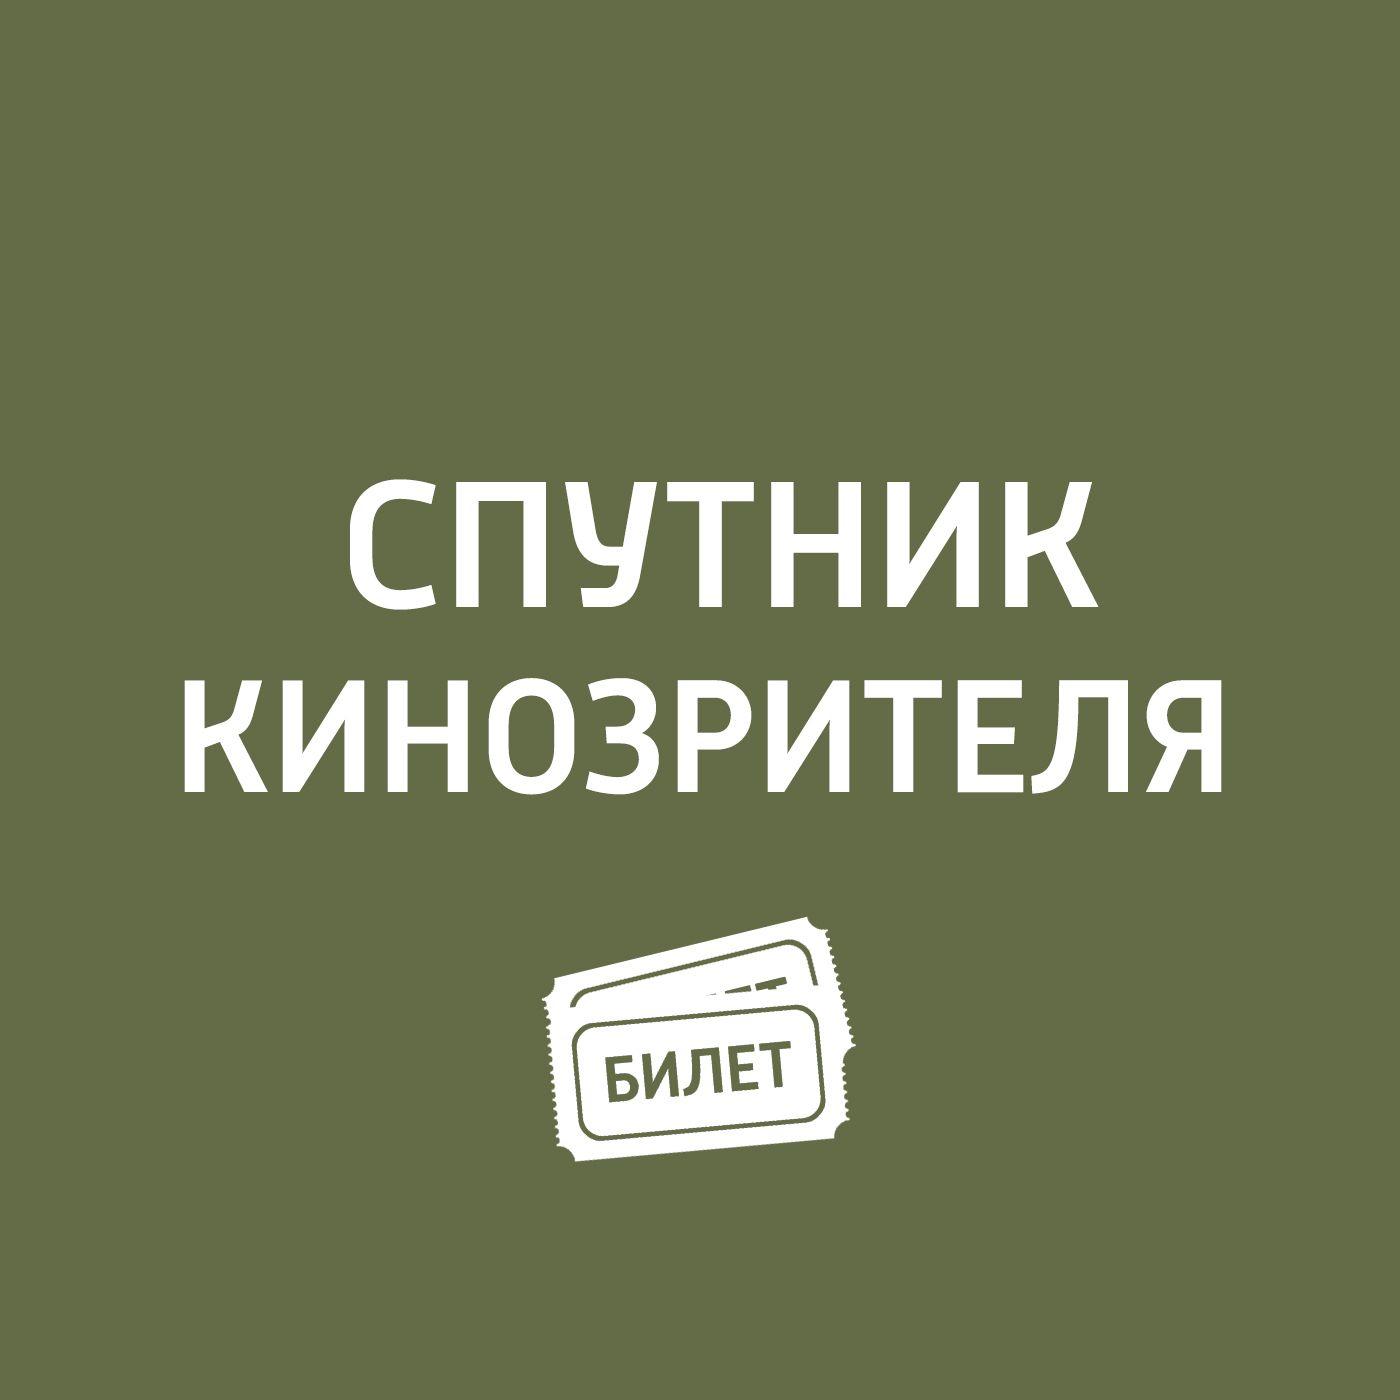 Антон Долин Об итогах Берлинале-2019 антон долин итоги берлинале 2018